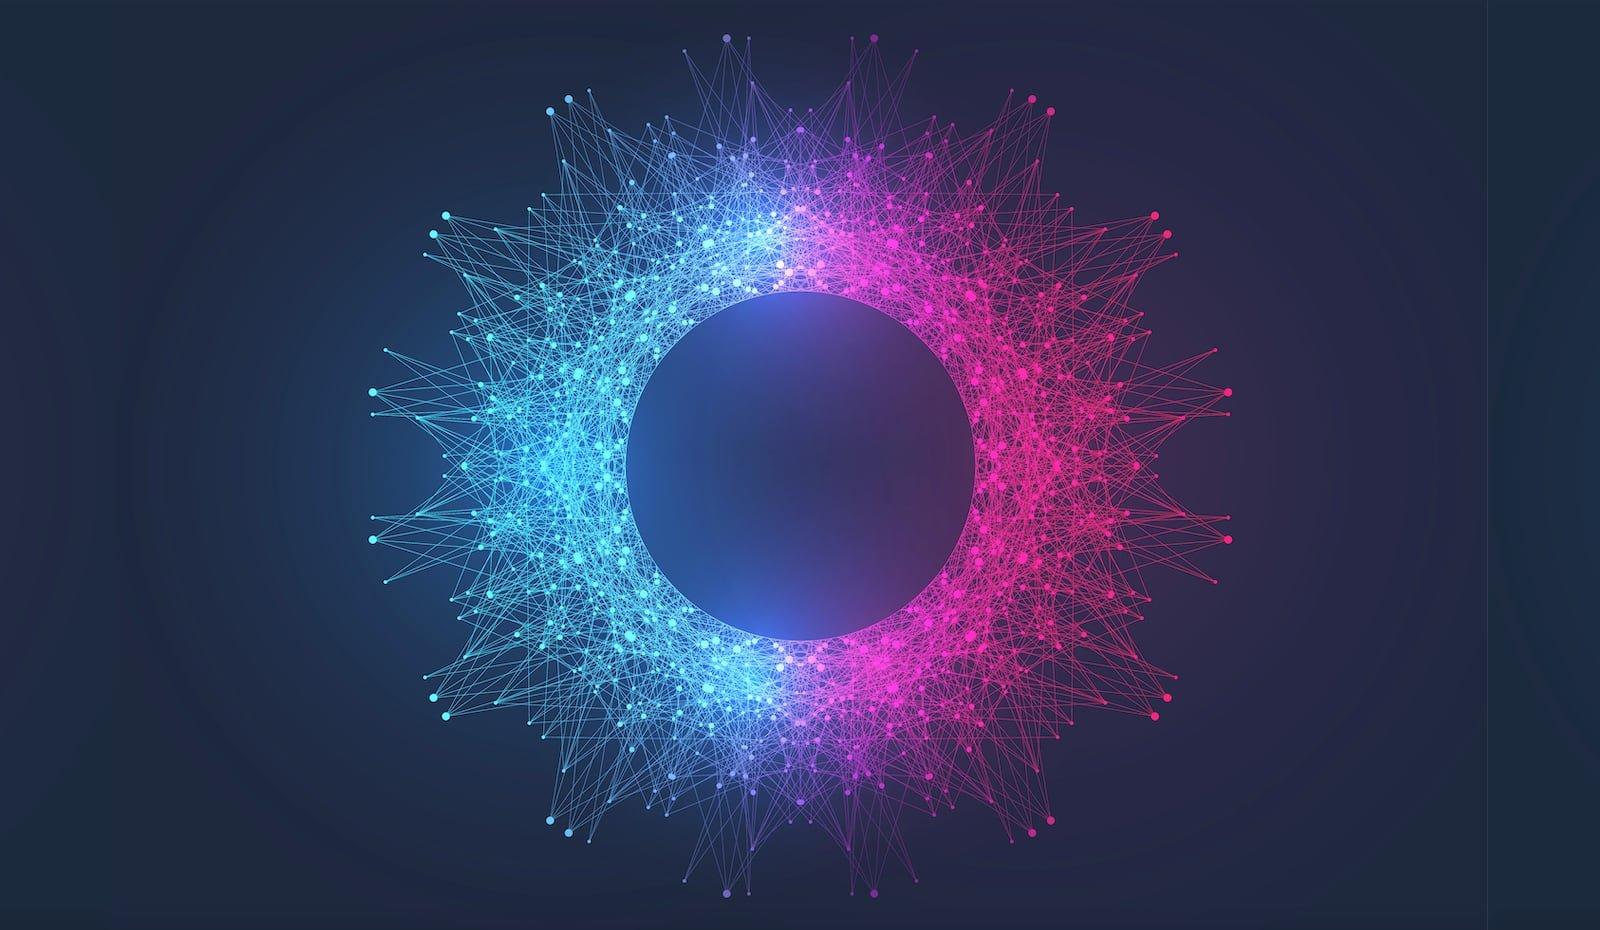 computación cuántica tecnologías ciberseguridad